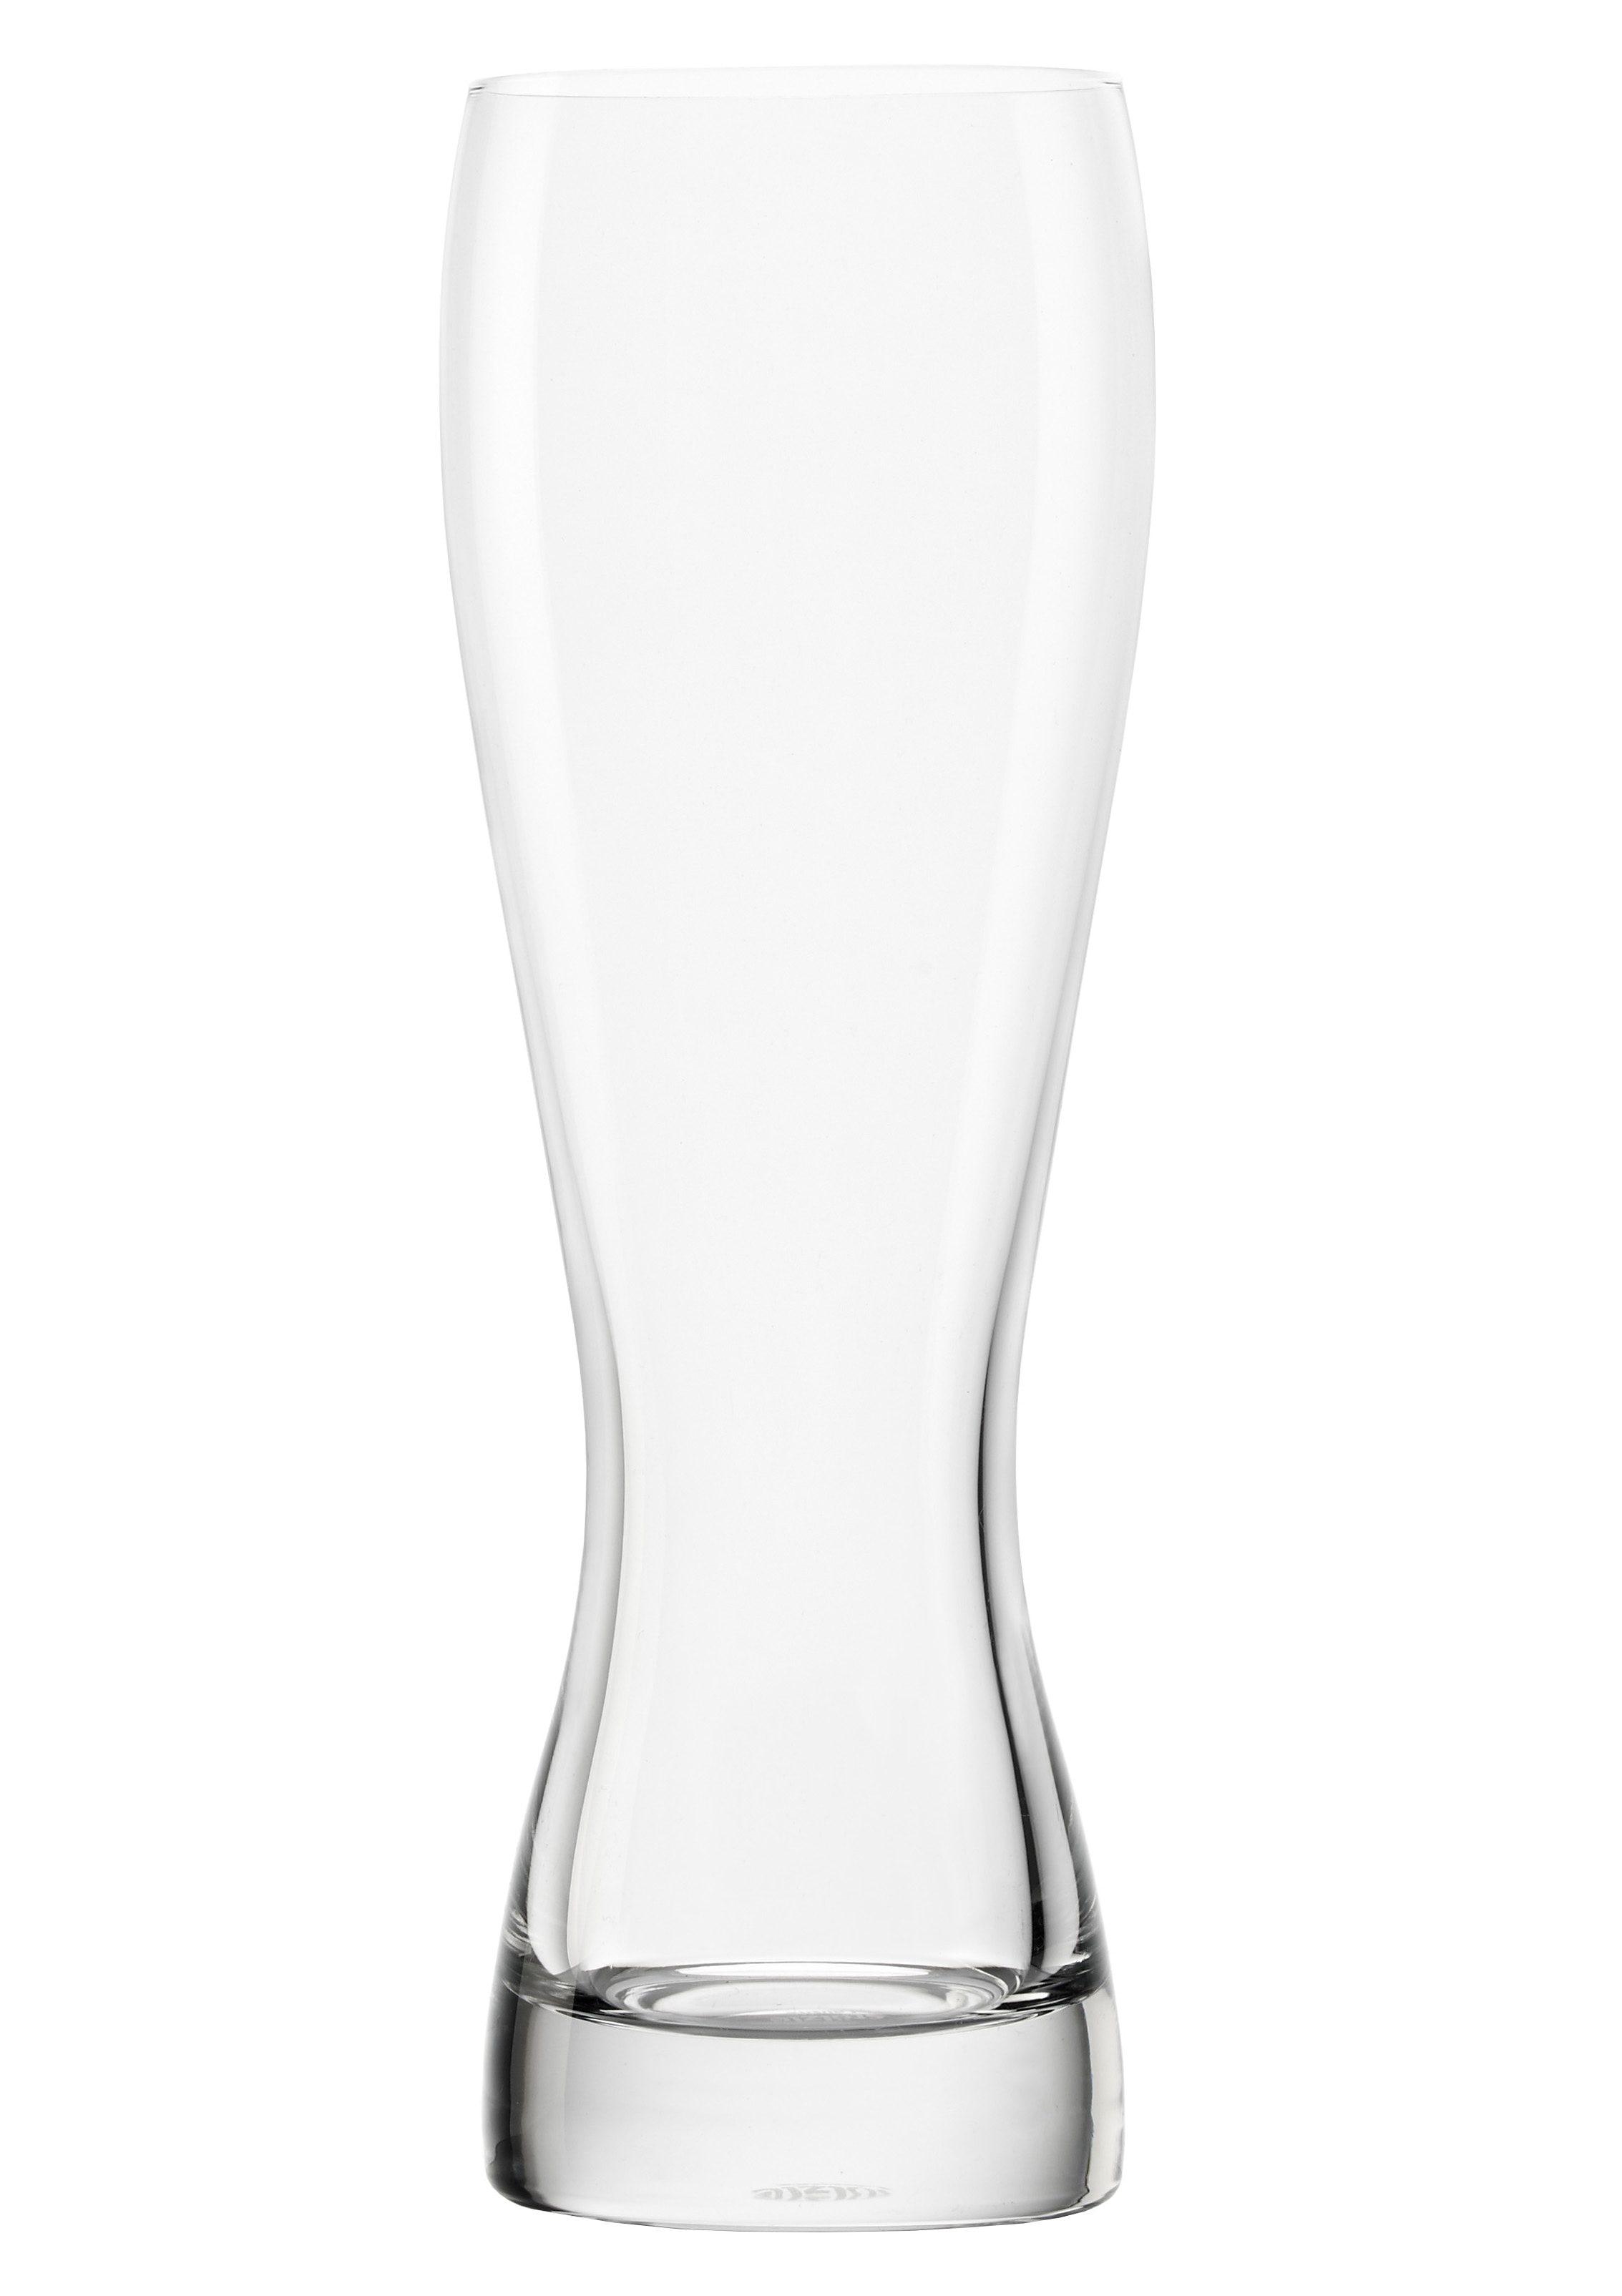 Stölzle Bierglas, (Set, 6 tlg.), 6-teilig farblos Bierglas Kristallgläser Gläser Glaswaren Haushaltswaren